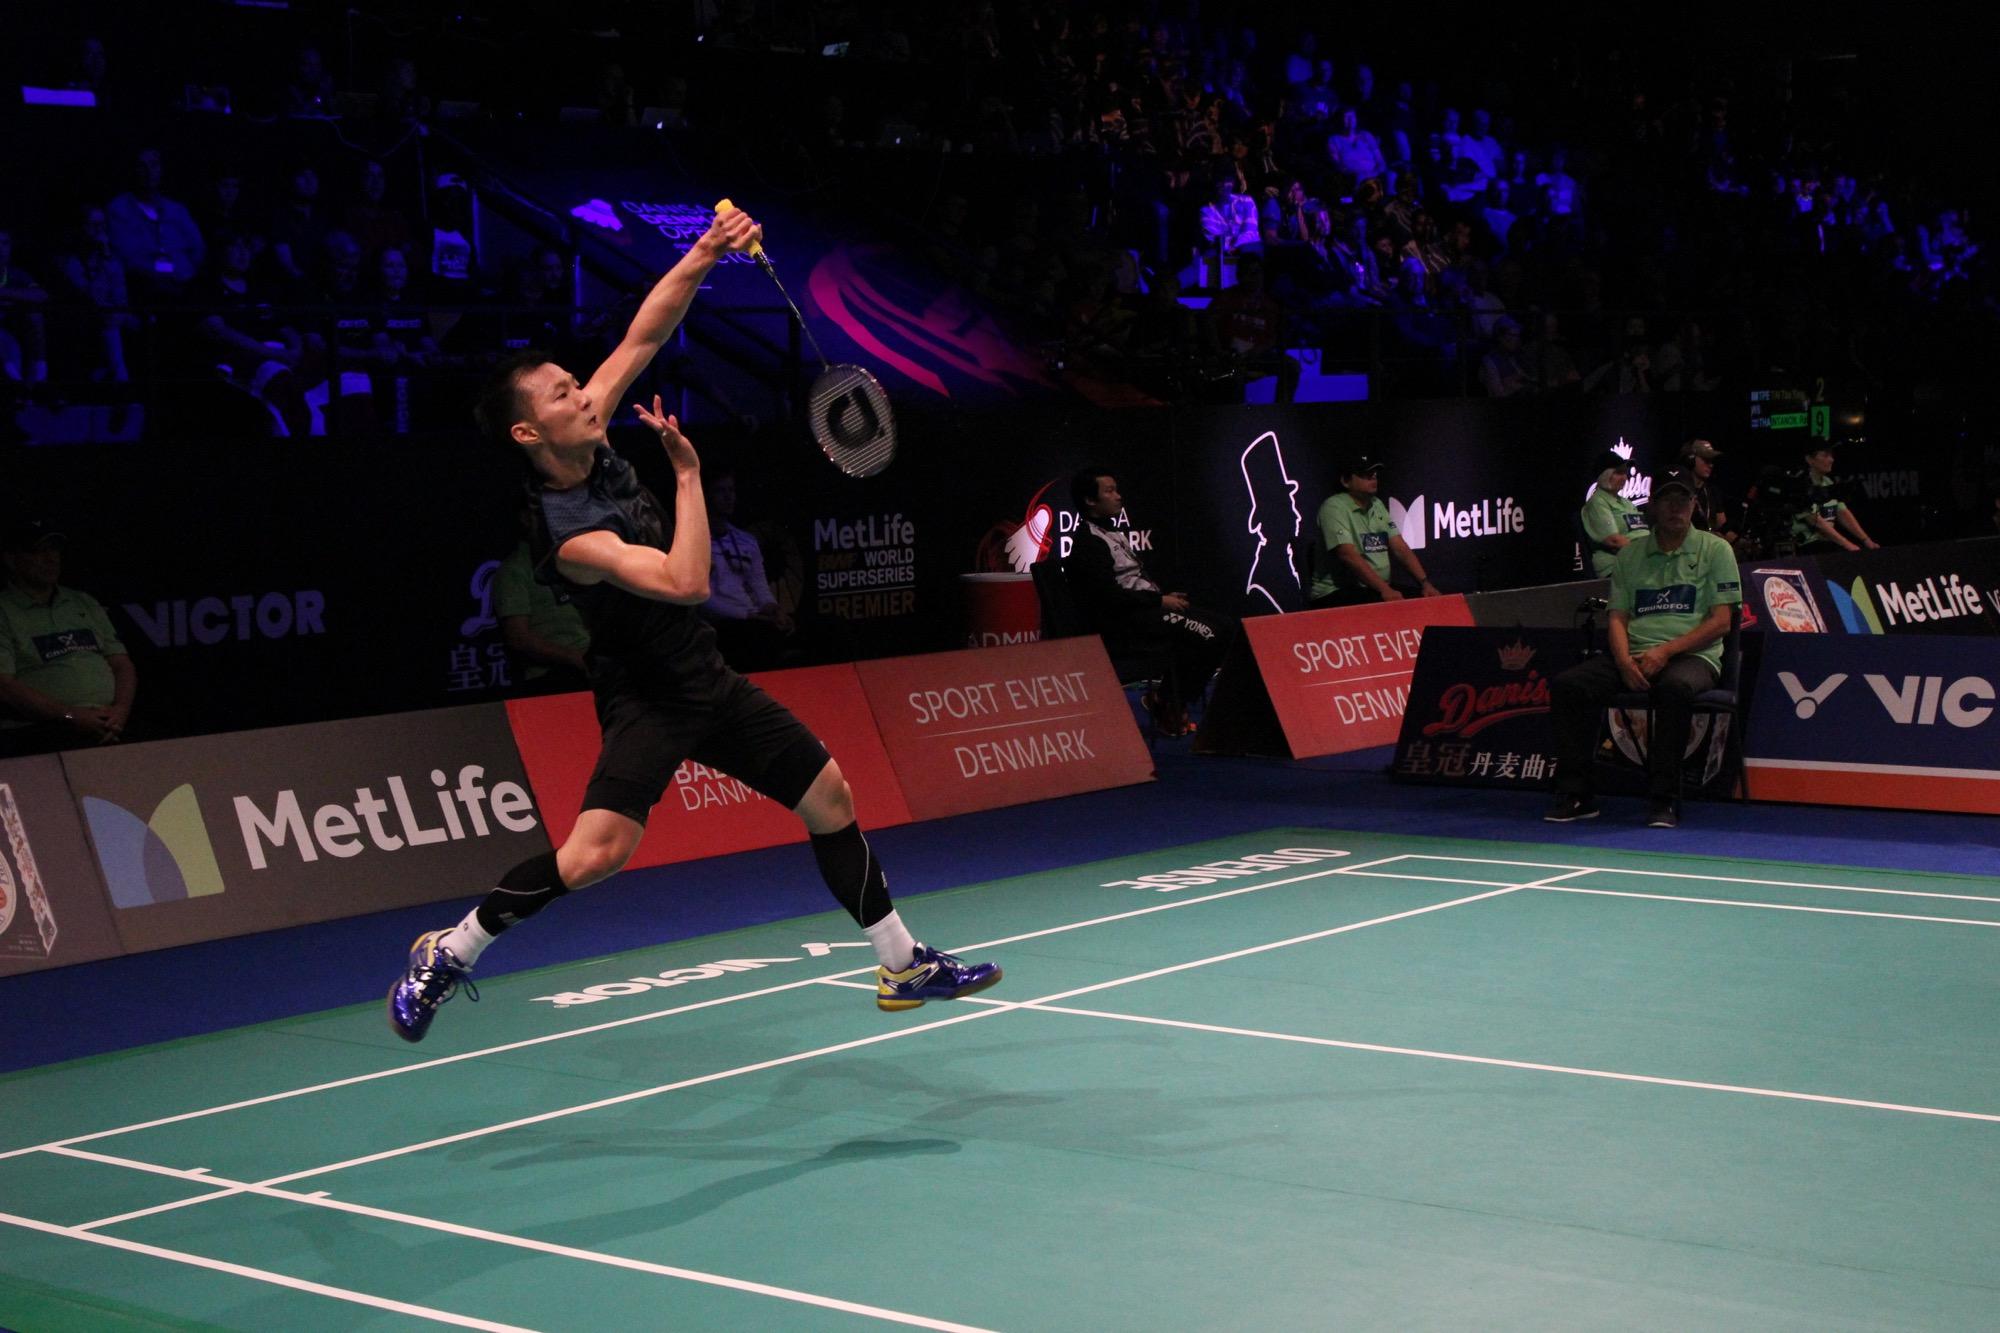 Ren verdensklasse 37 ¥rig klar til Denmark Open finale i